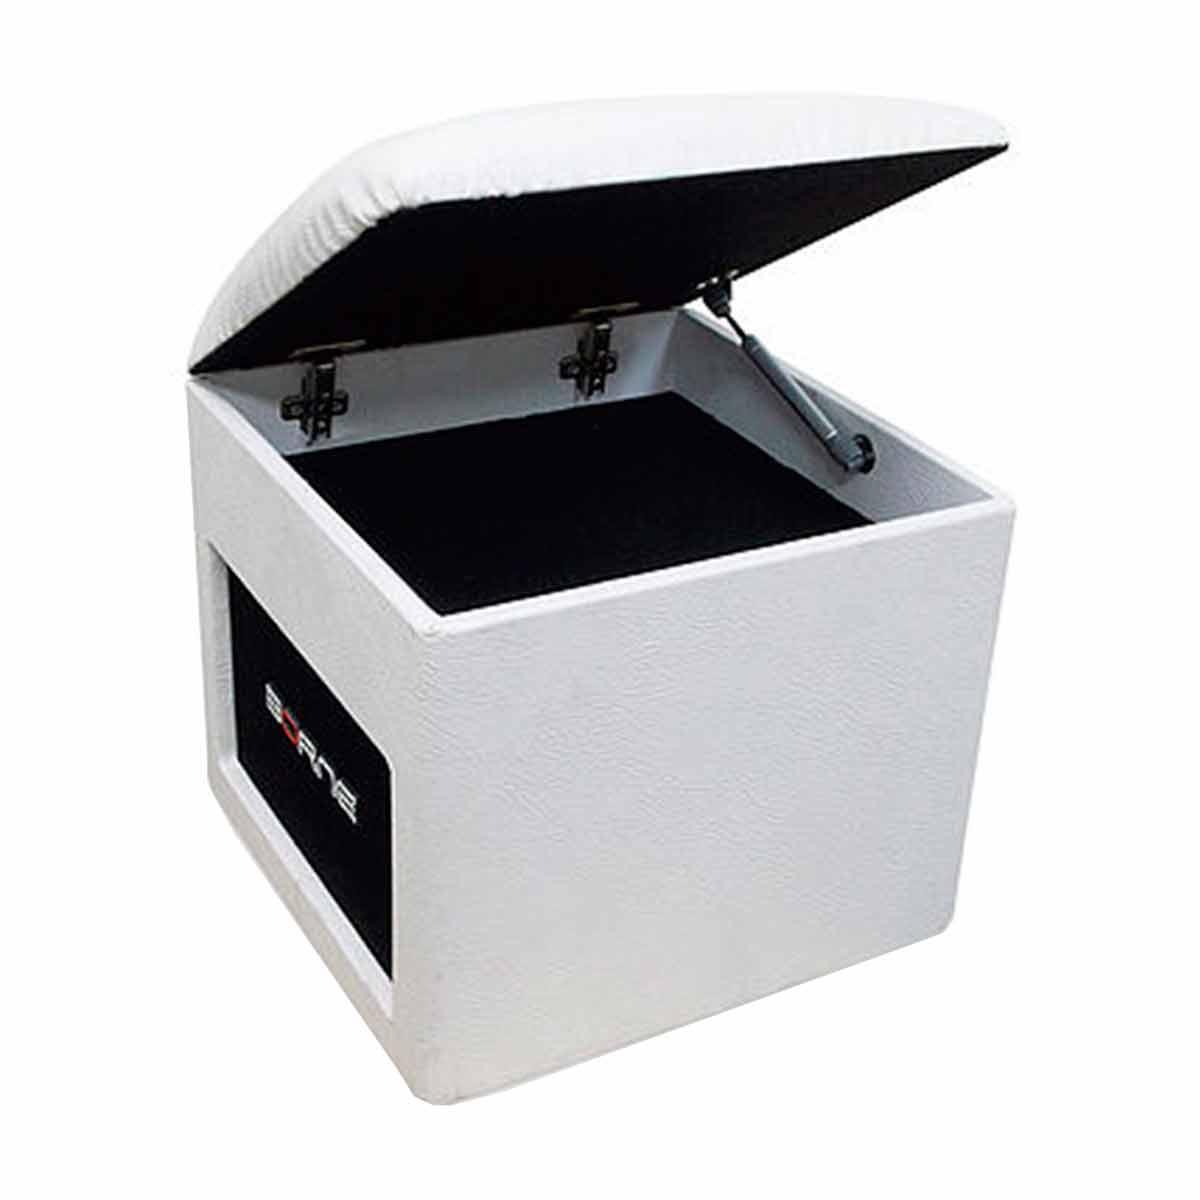 Caixa Ativa c/ Bluetooth e USB Lounge Cube Branca - Borne